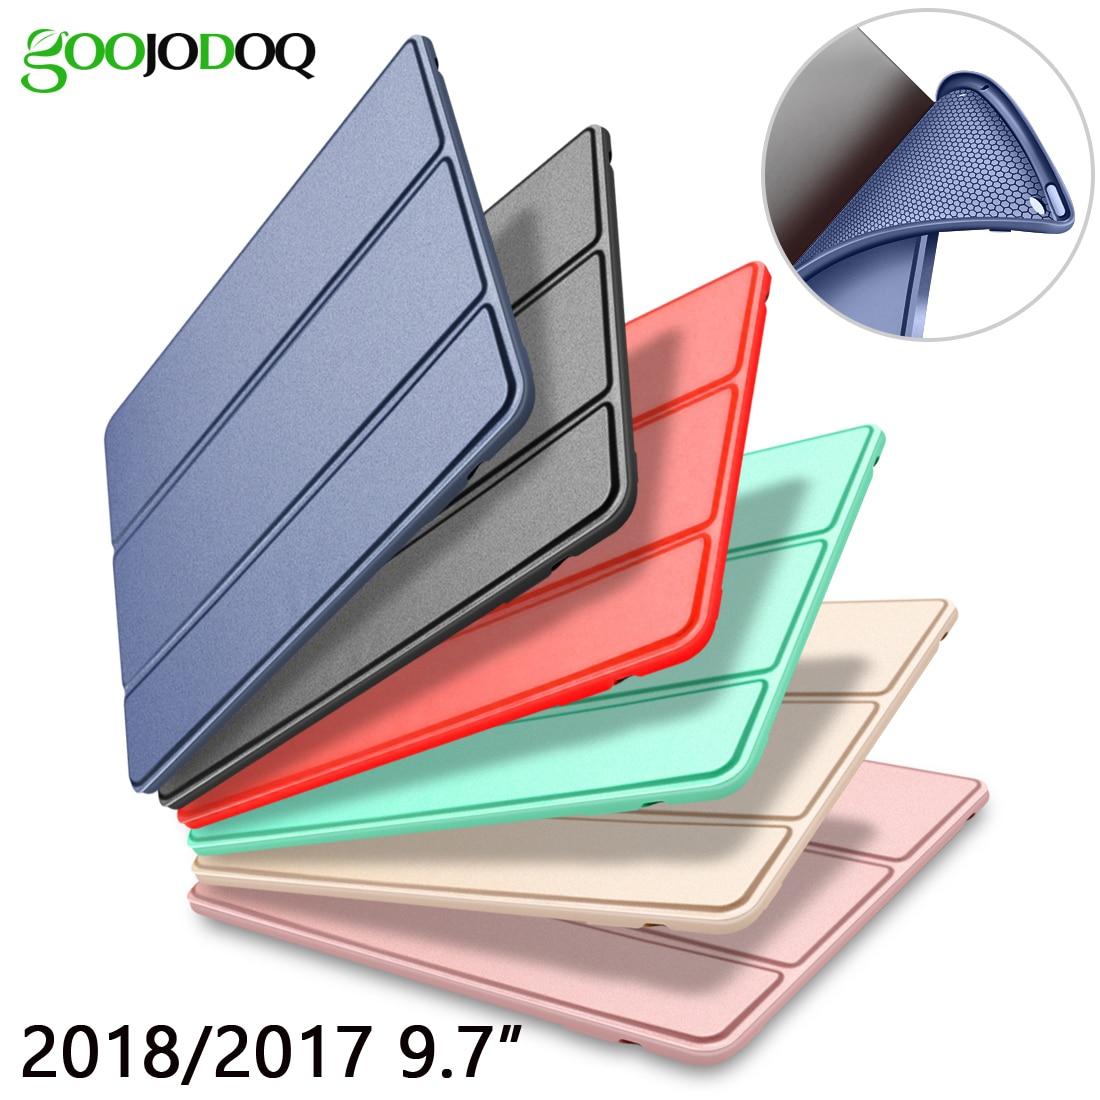 Für iPad 9,7 2017 2018 Fall A1822 A1893 Silikon-weiche Rückseitige Pu-leder Smart Cover für iPad 2018 Fall 9,7 zoll 2017 fall